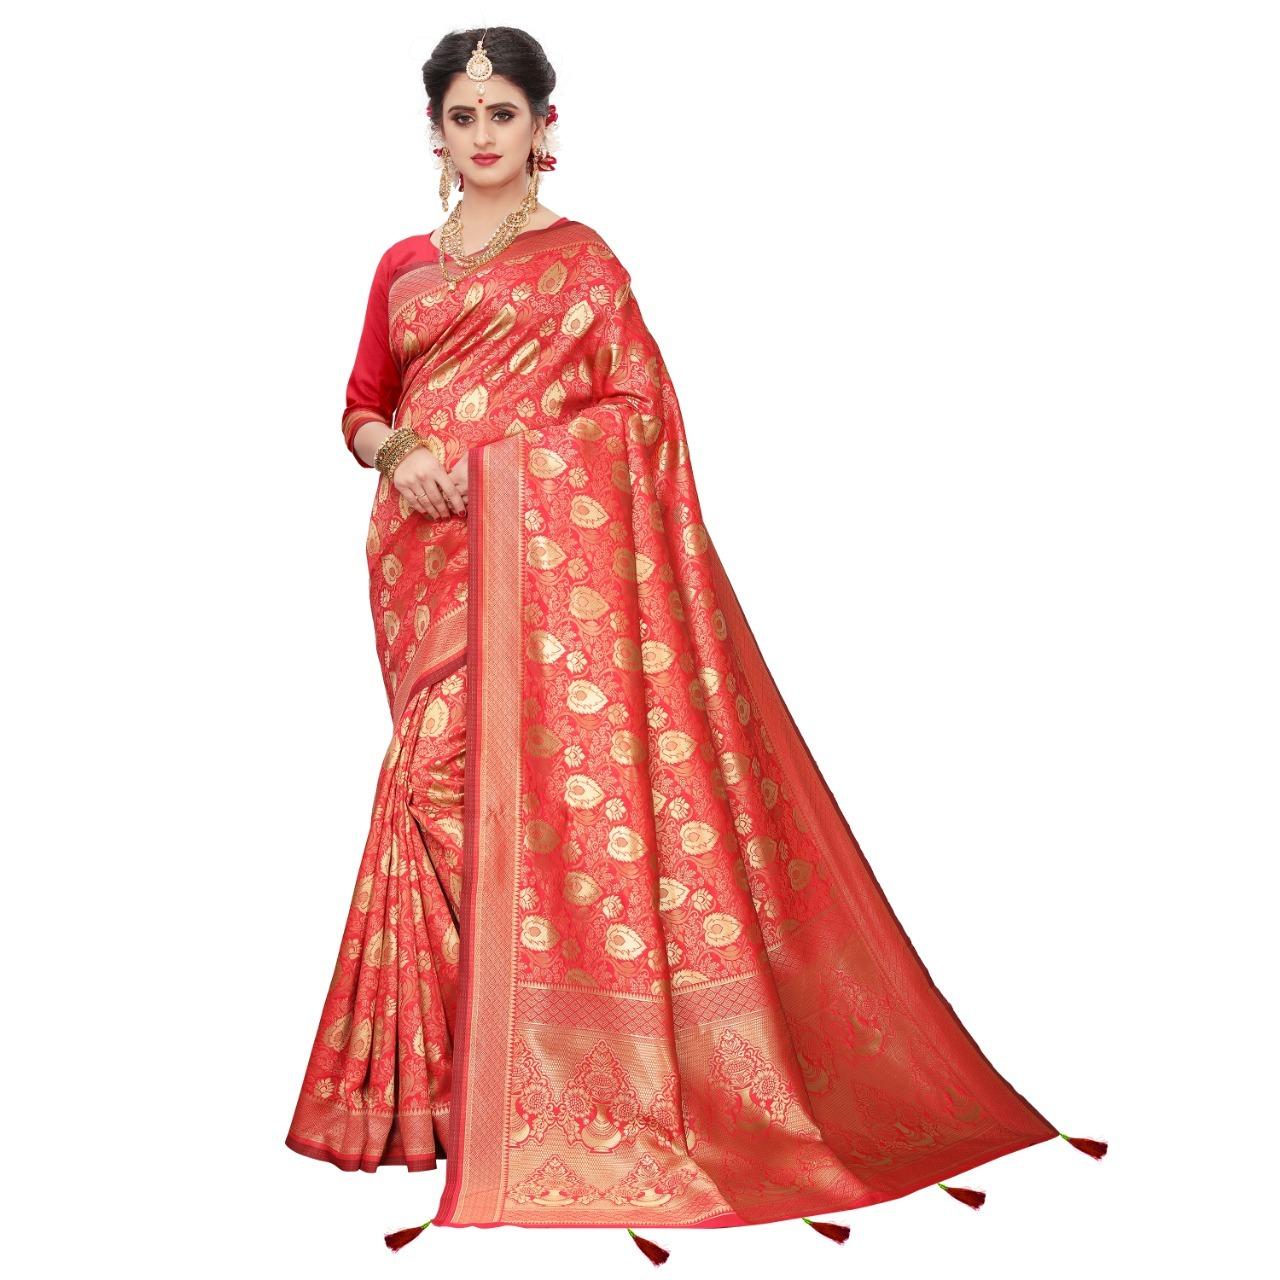 Rich Pallu banarasi Silk Saree with Jacquard Work  & Latkan